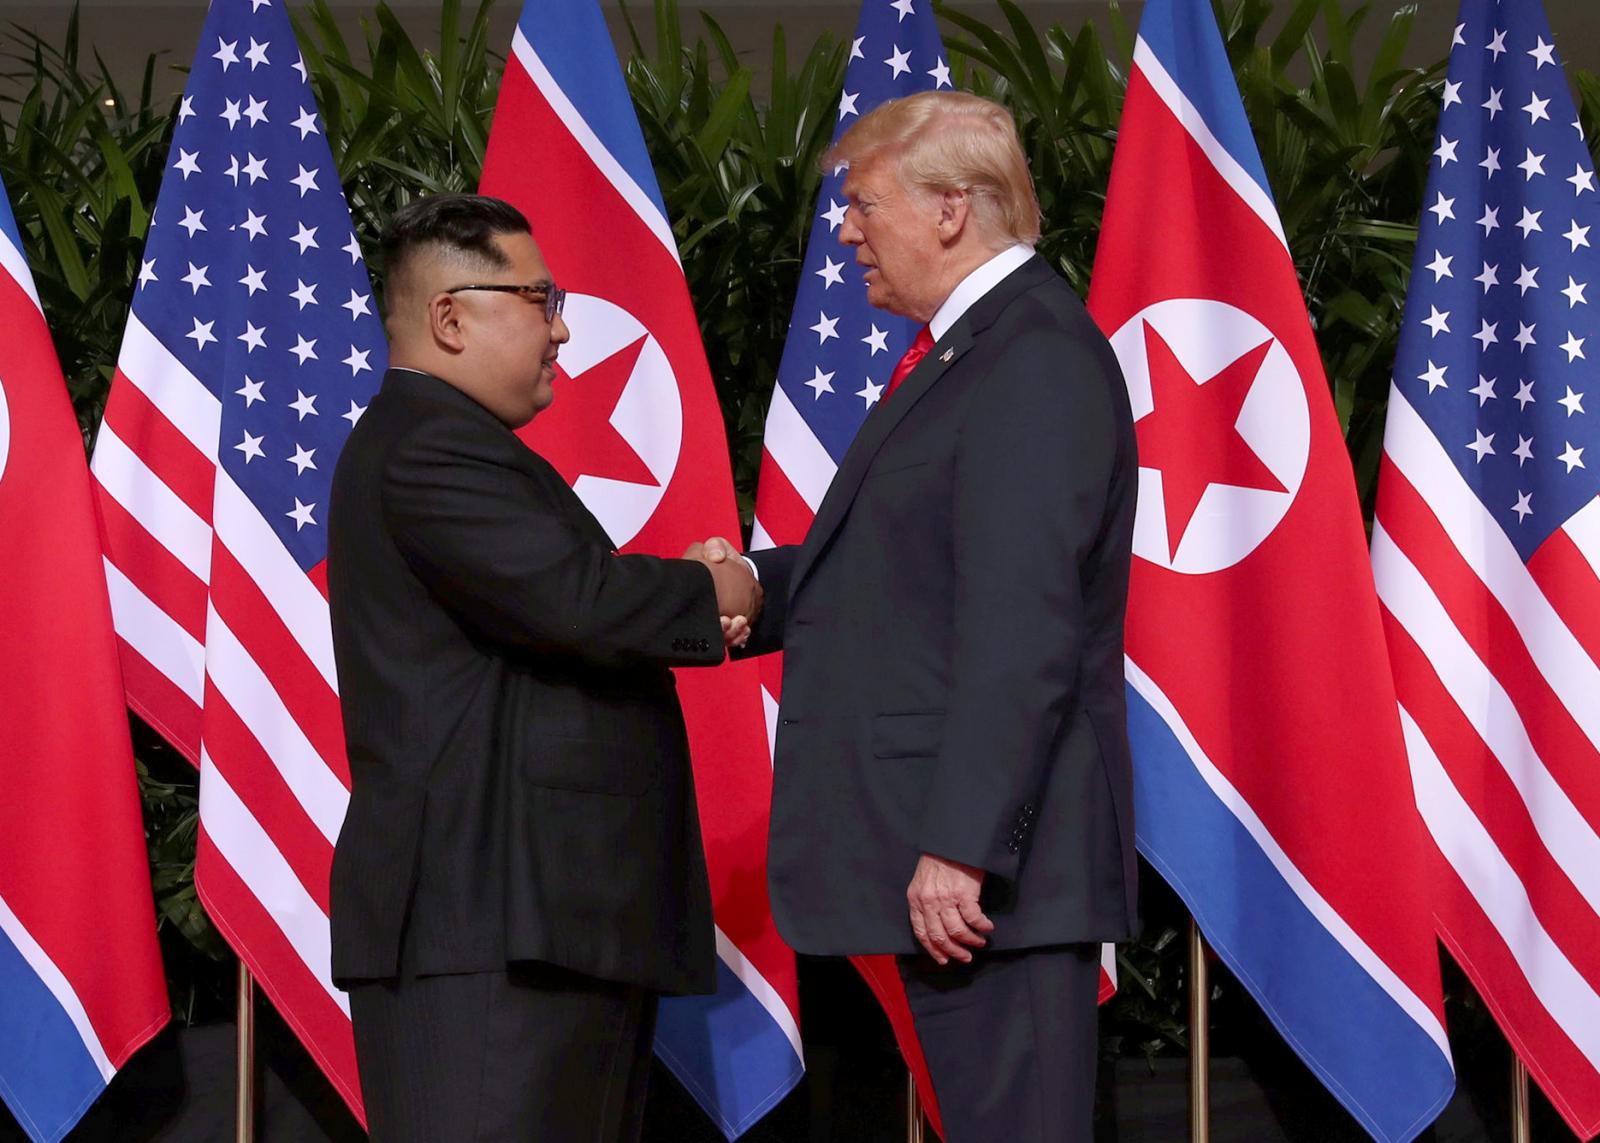 Donald Trump shakes hands with Kim Jong Un